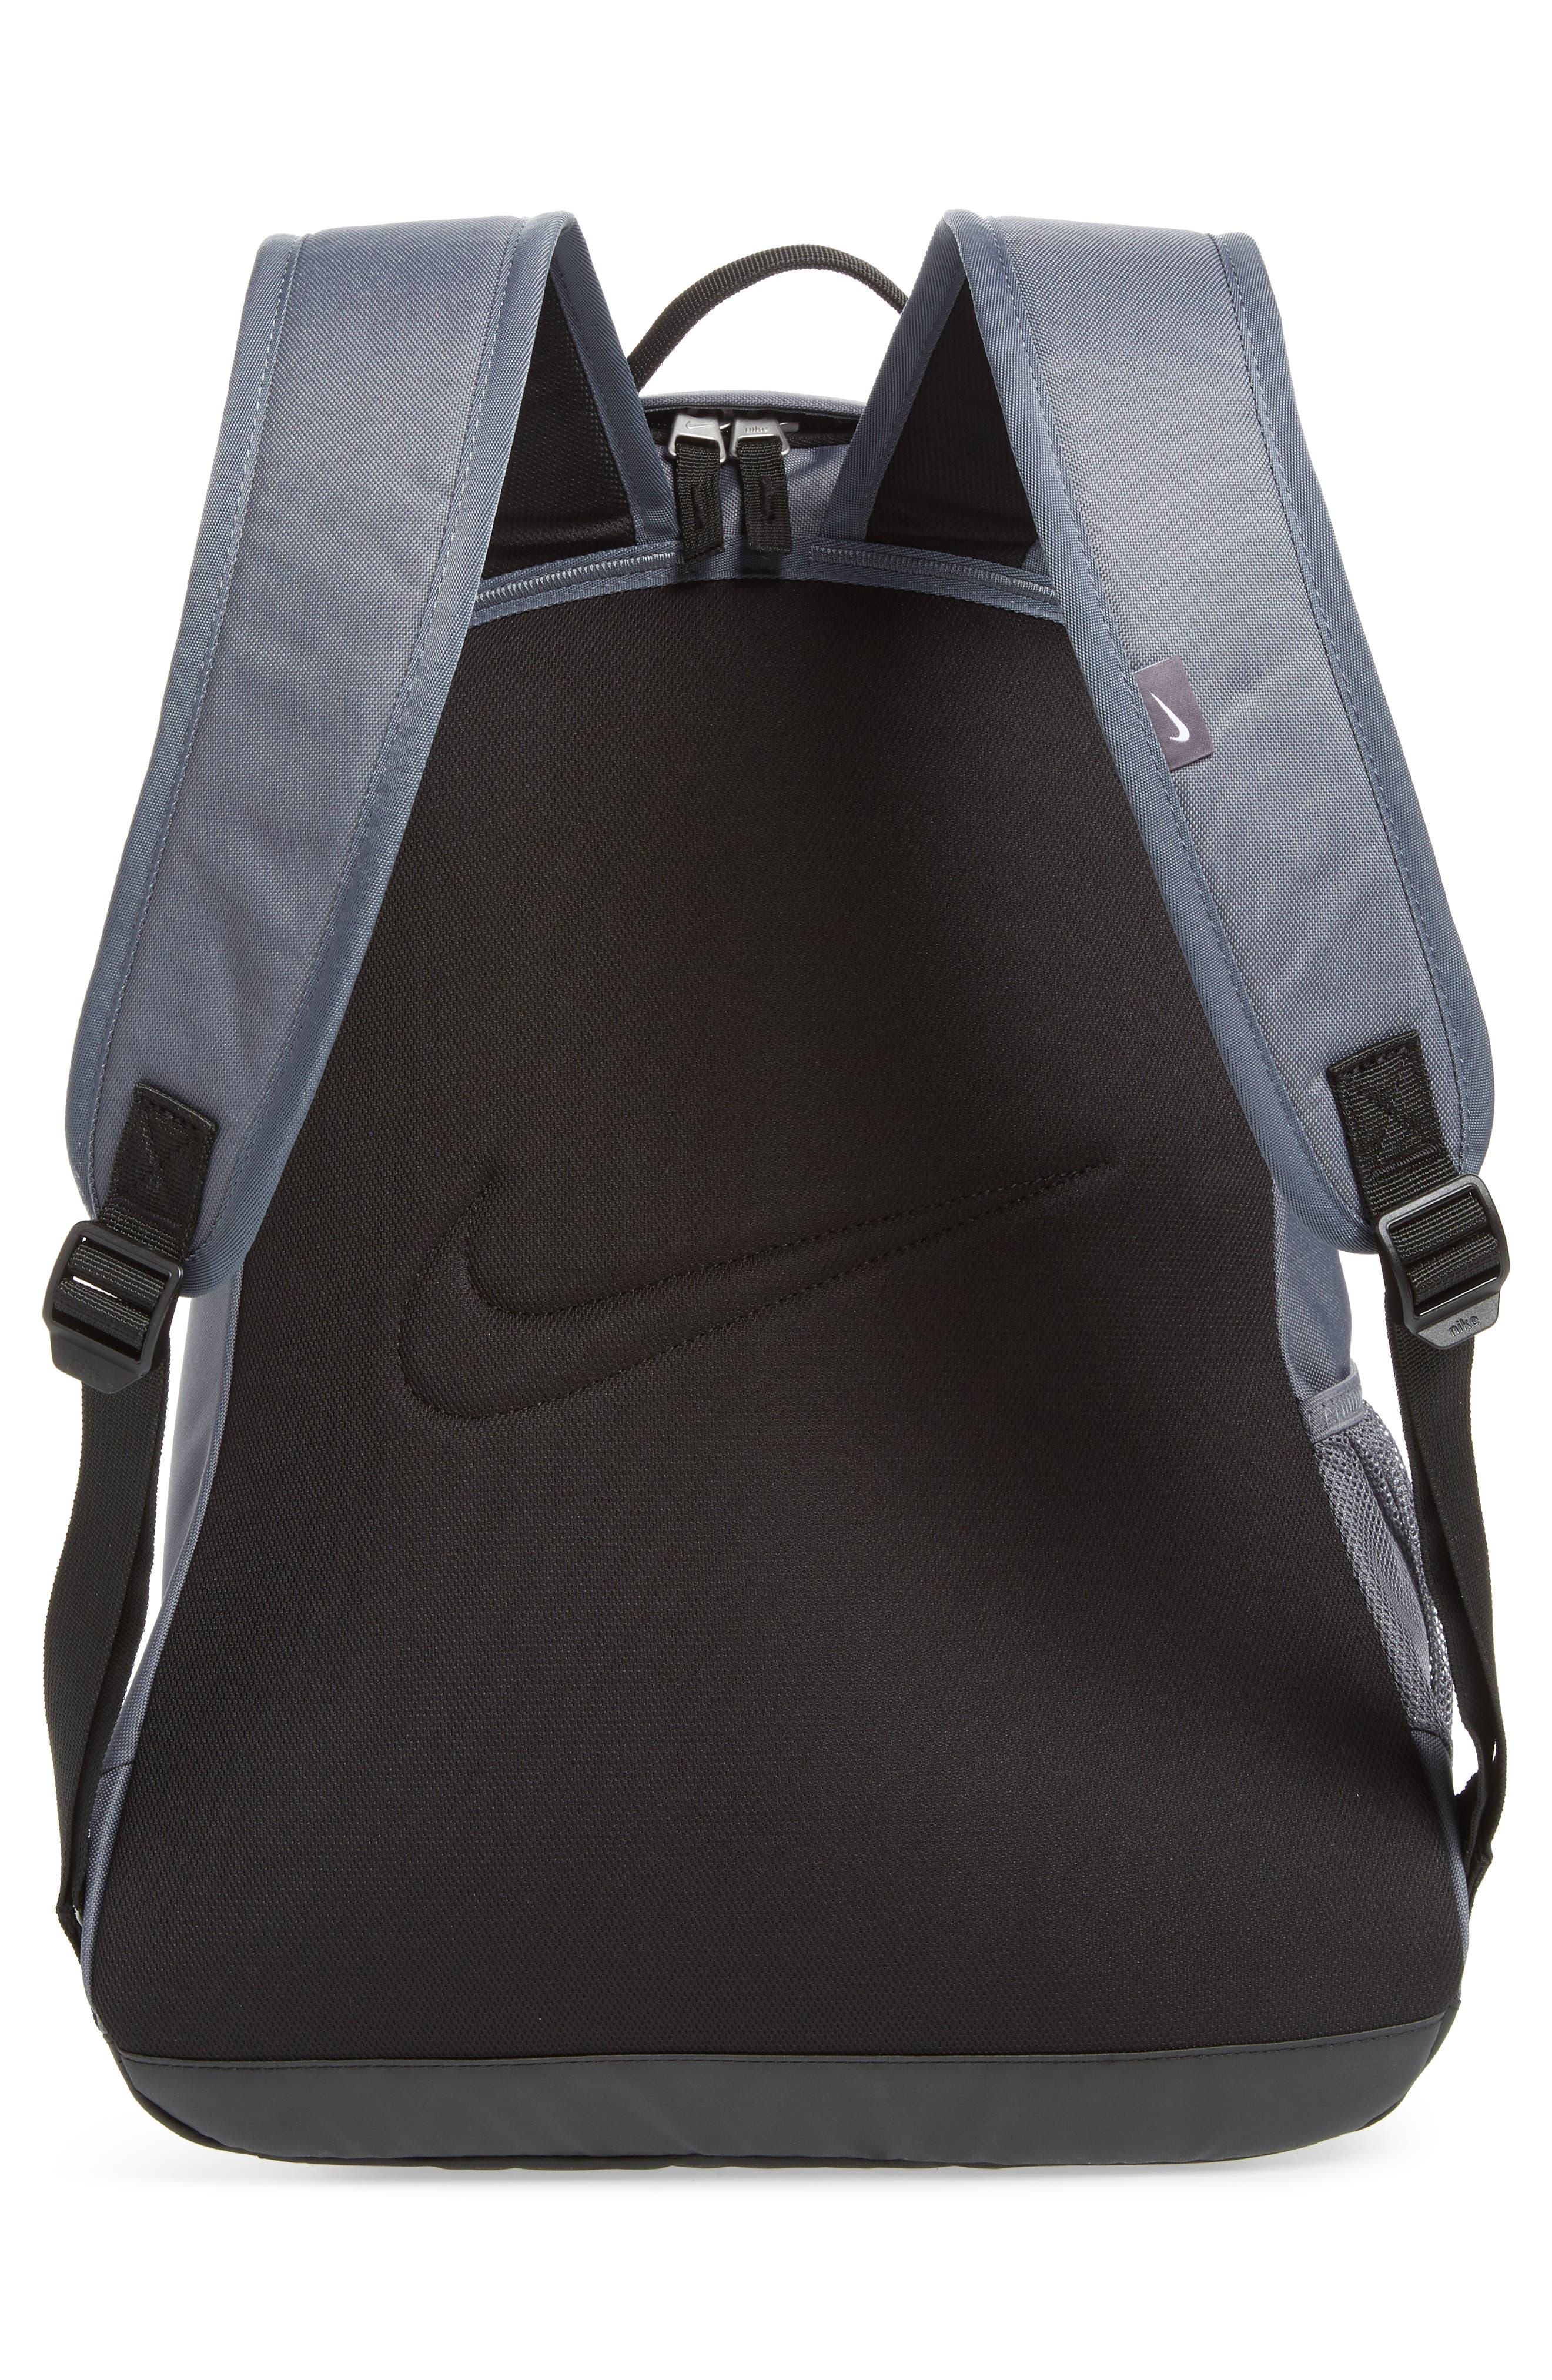 a20011895595 Shop Nike Club Team Backpack - Grey In Flint Grey  Black  White